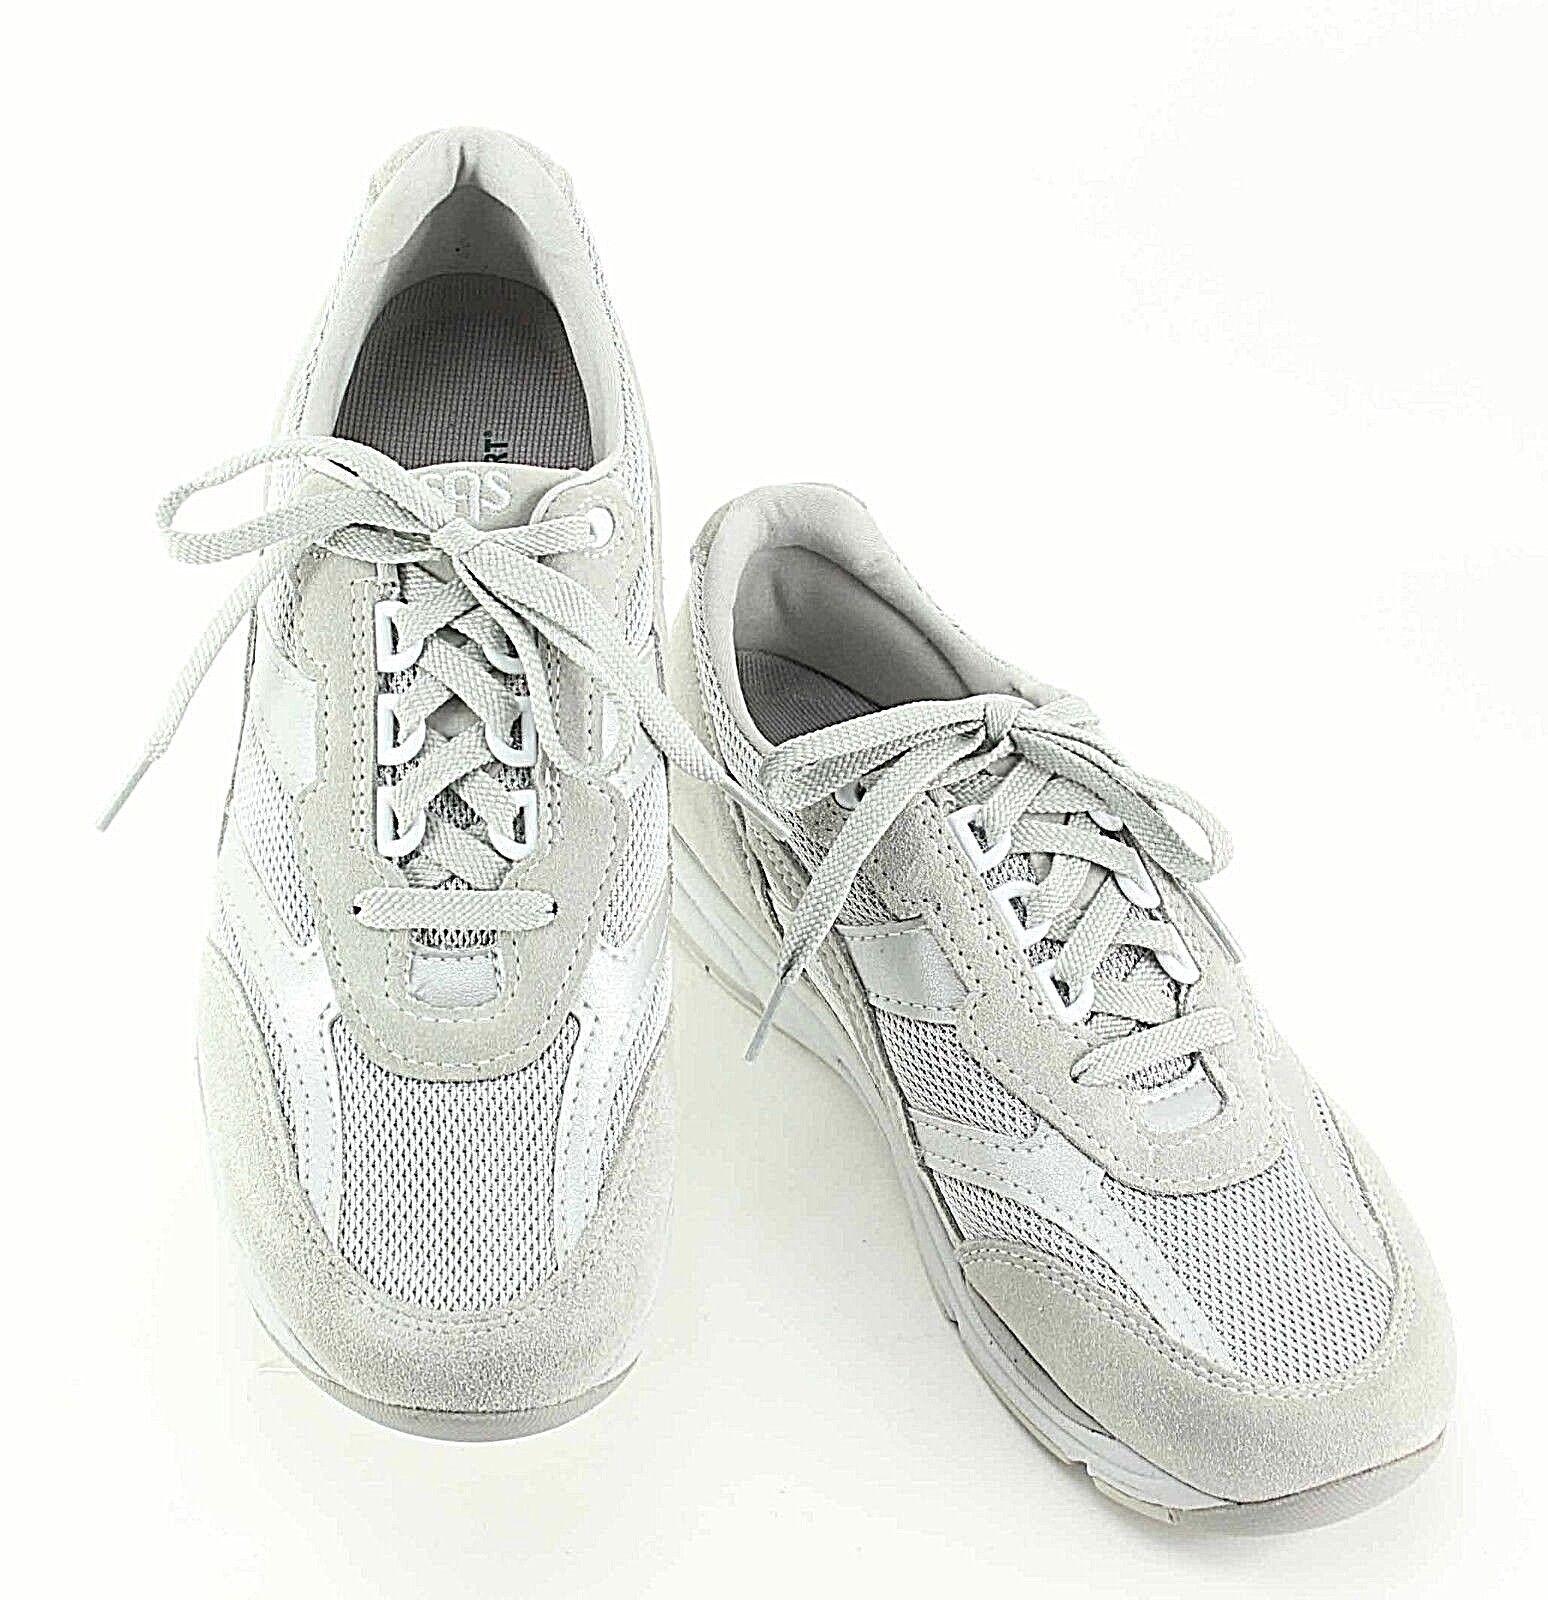 SAS Sz 9.5 Gray Tripad Comfort Suede Mesh Tennis Schuhes F070